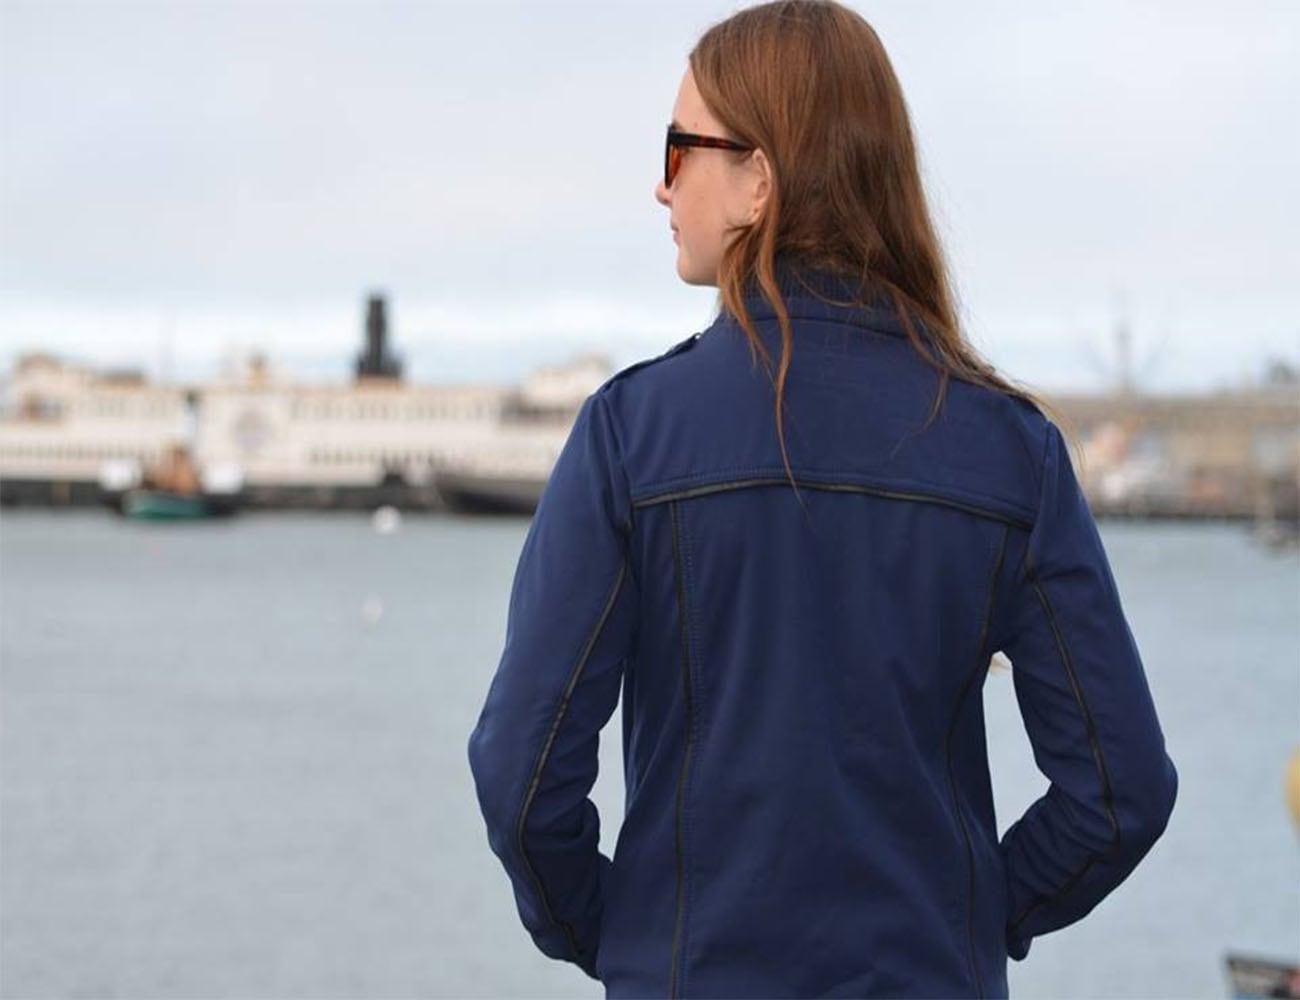 BAUBAX 2.0 25-Feature Travel Jacket